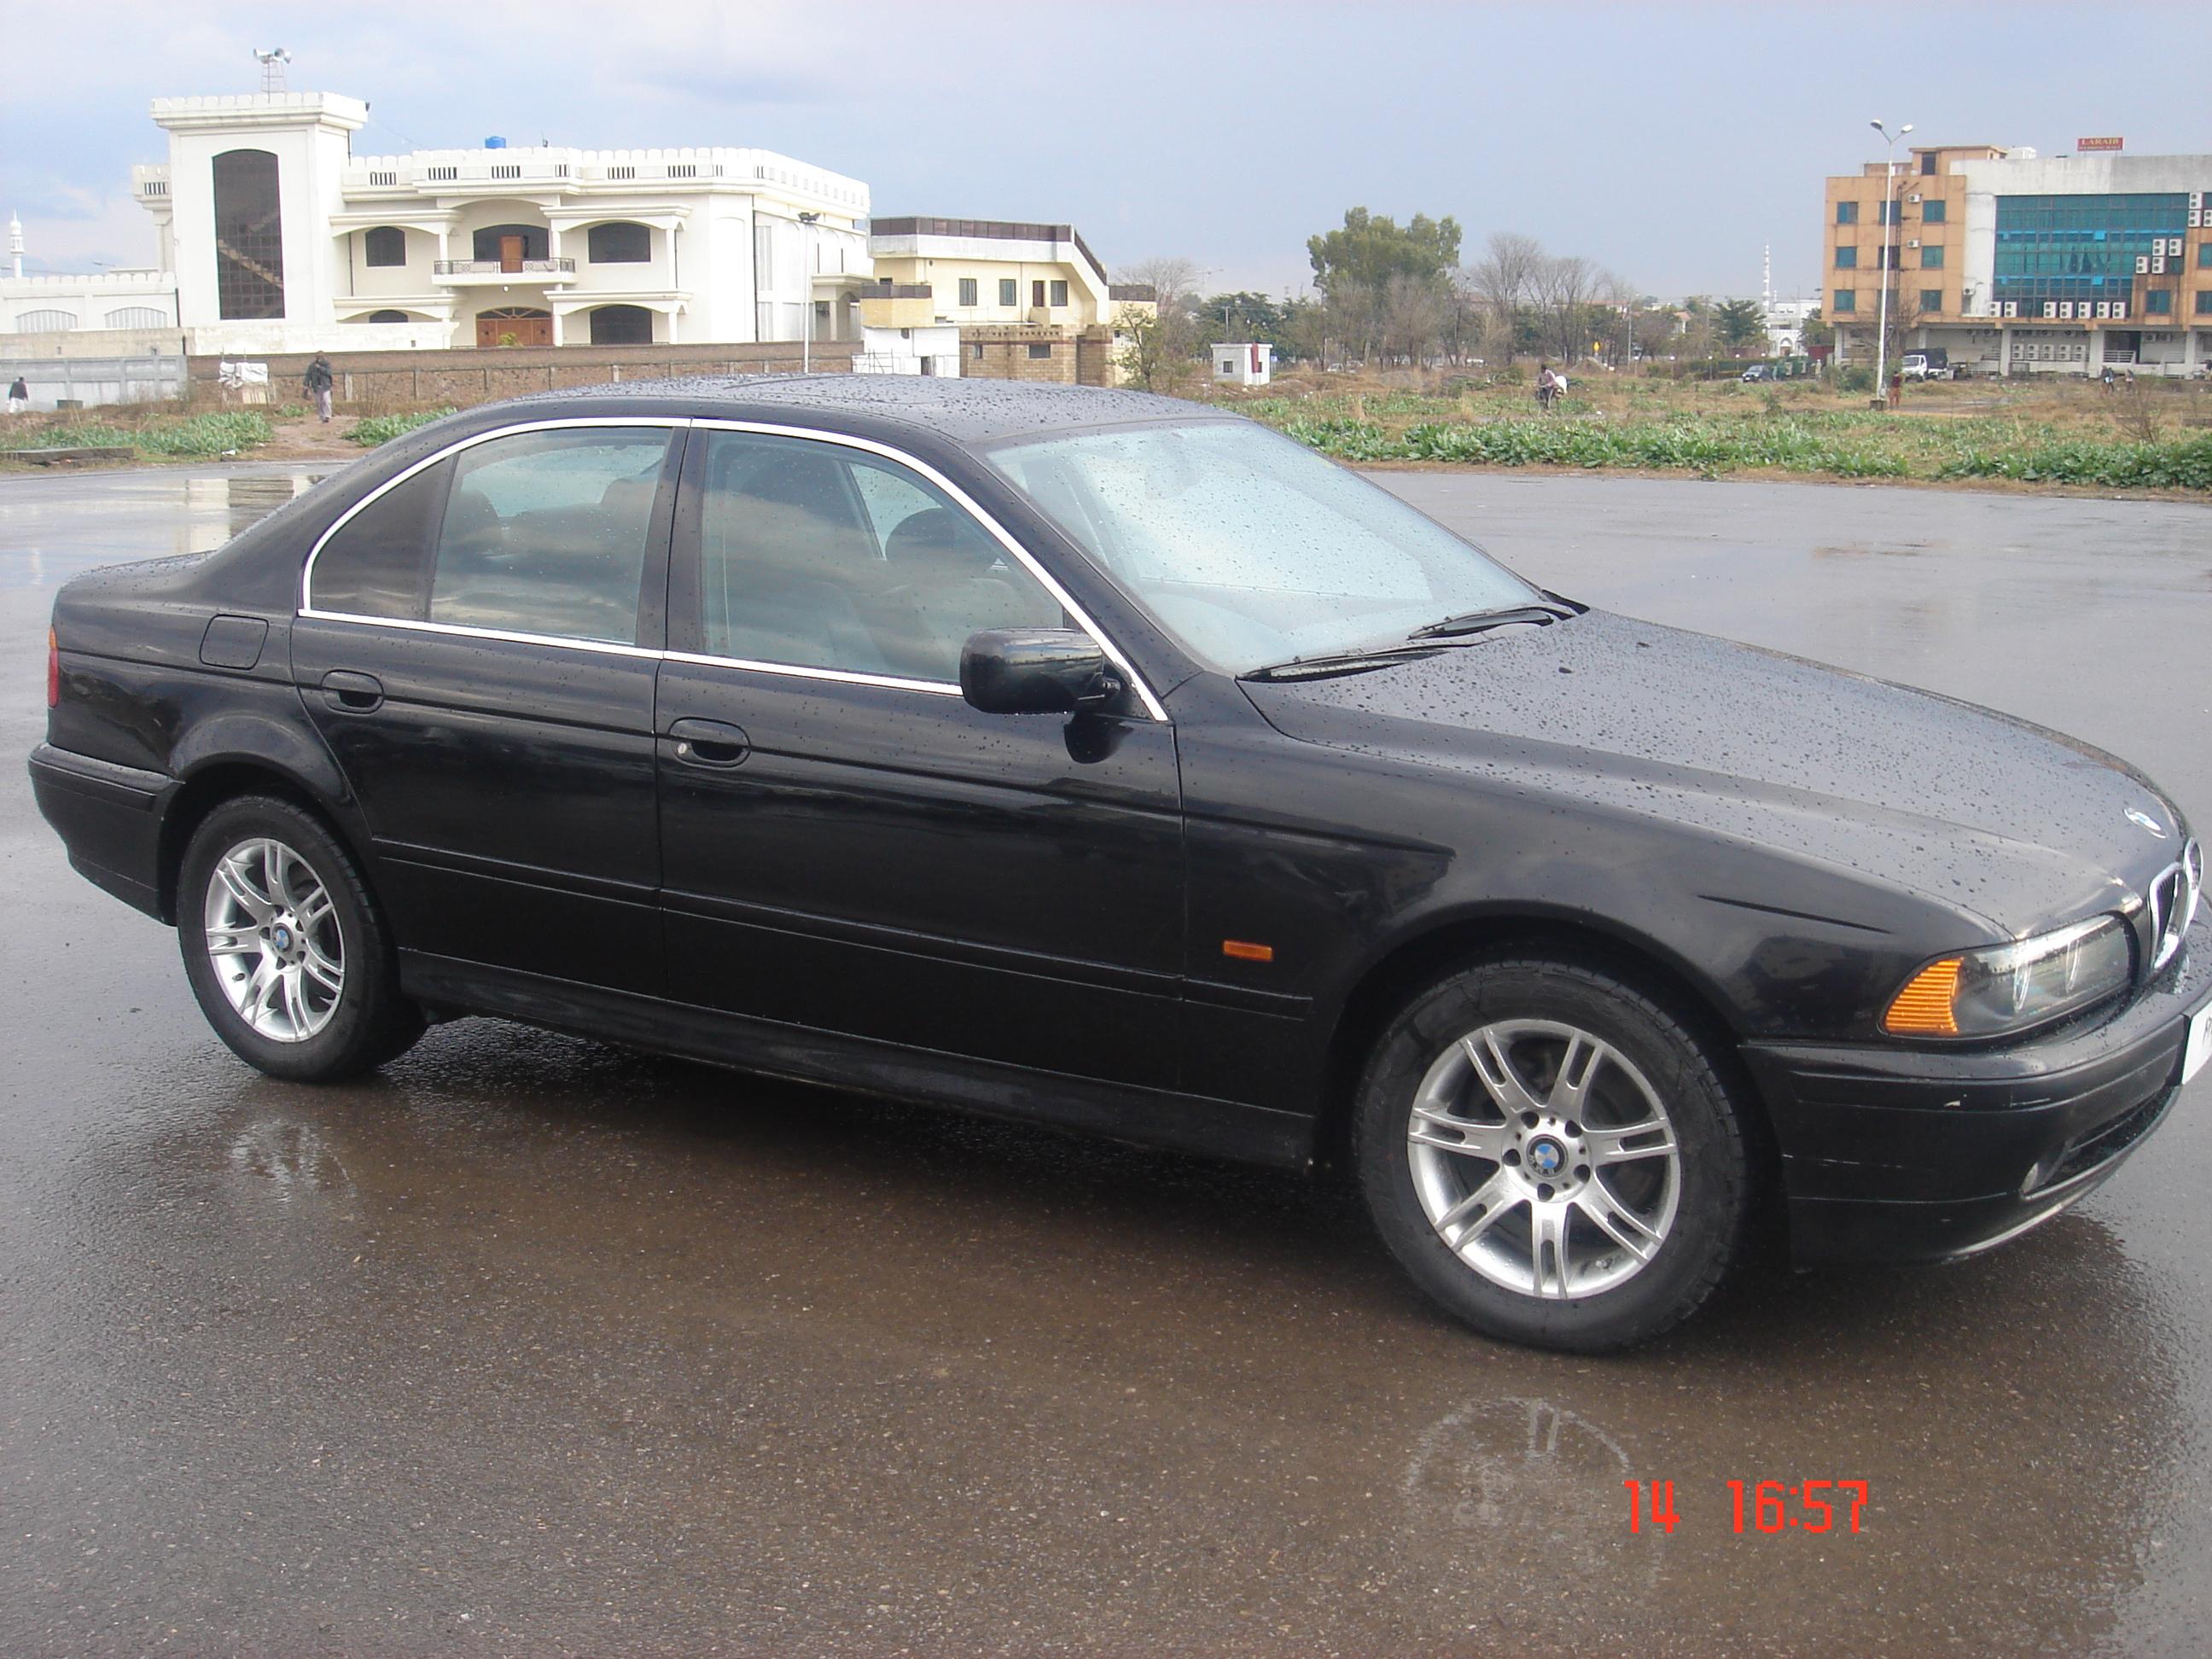 BMW 5 Series - 2002 royal  Image-1